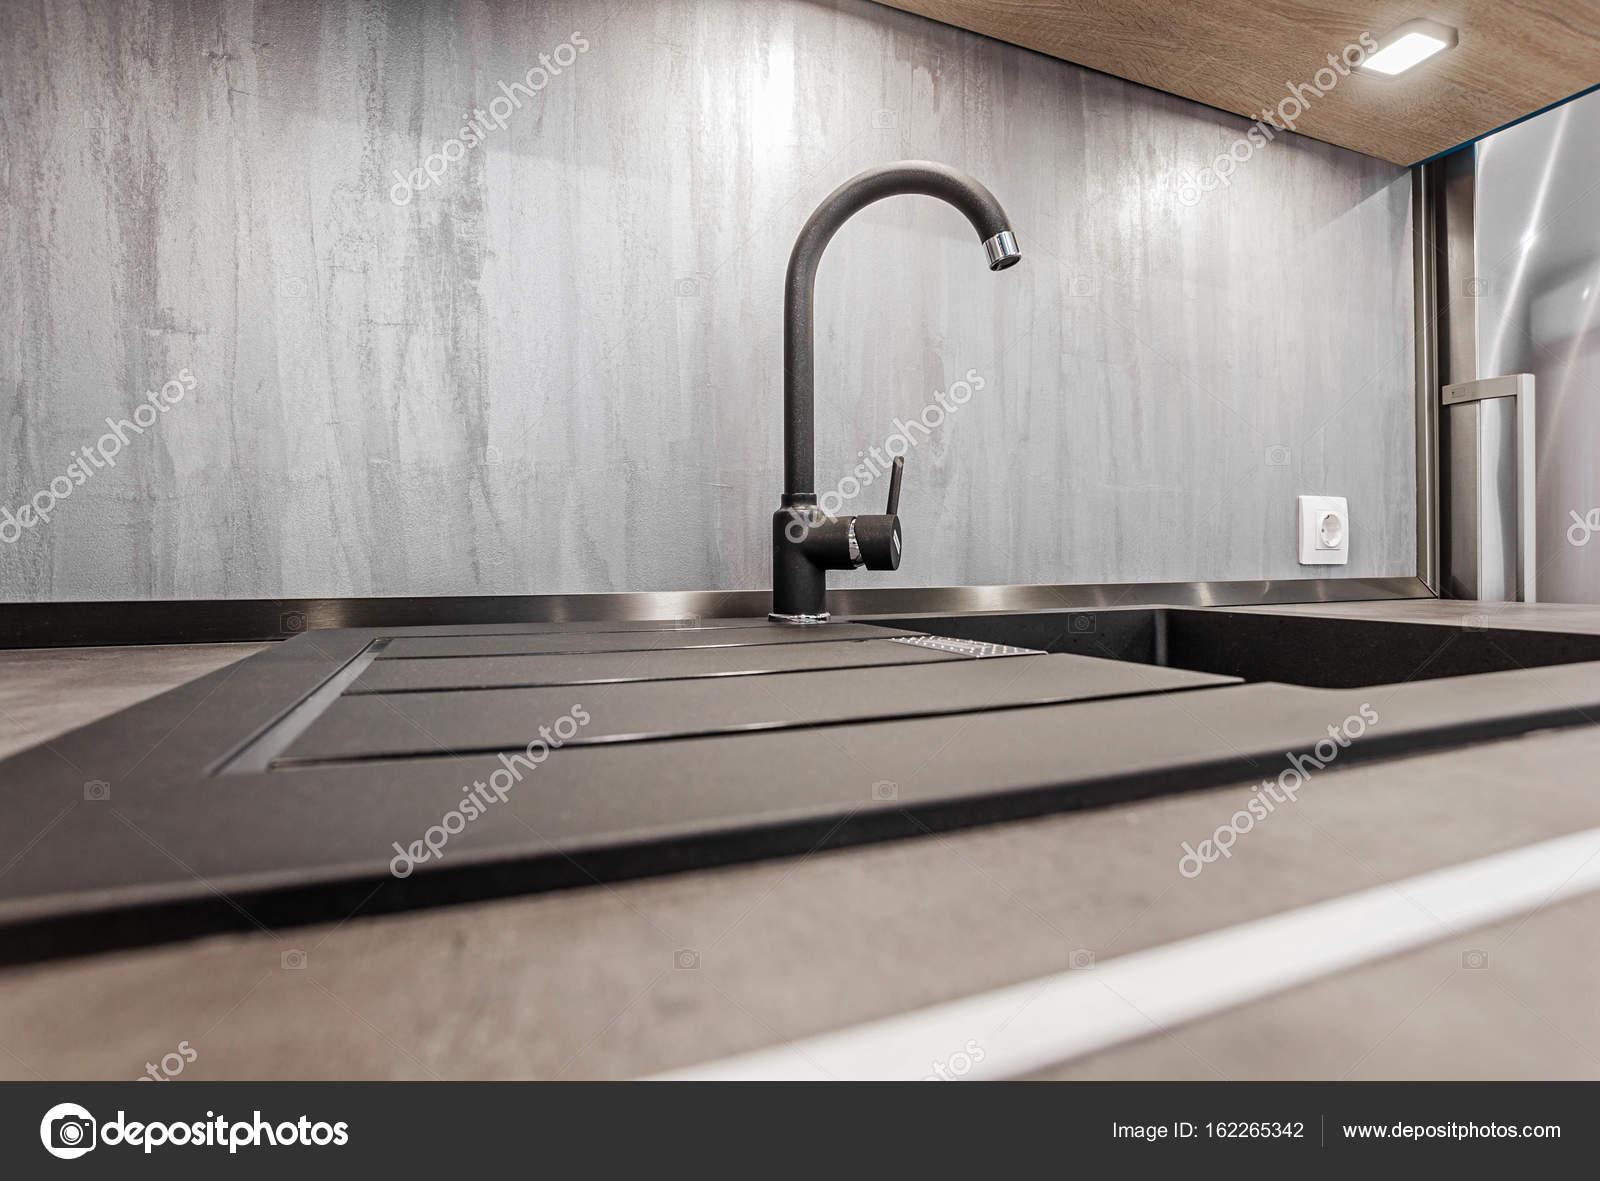 Cocina moderna. Grifo y fregadero — Fotos de Stock © fly_wish #162265342